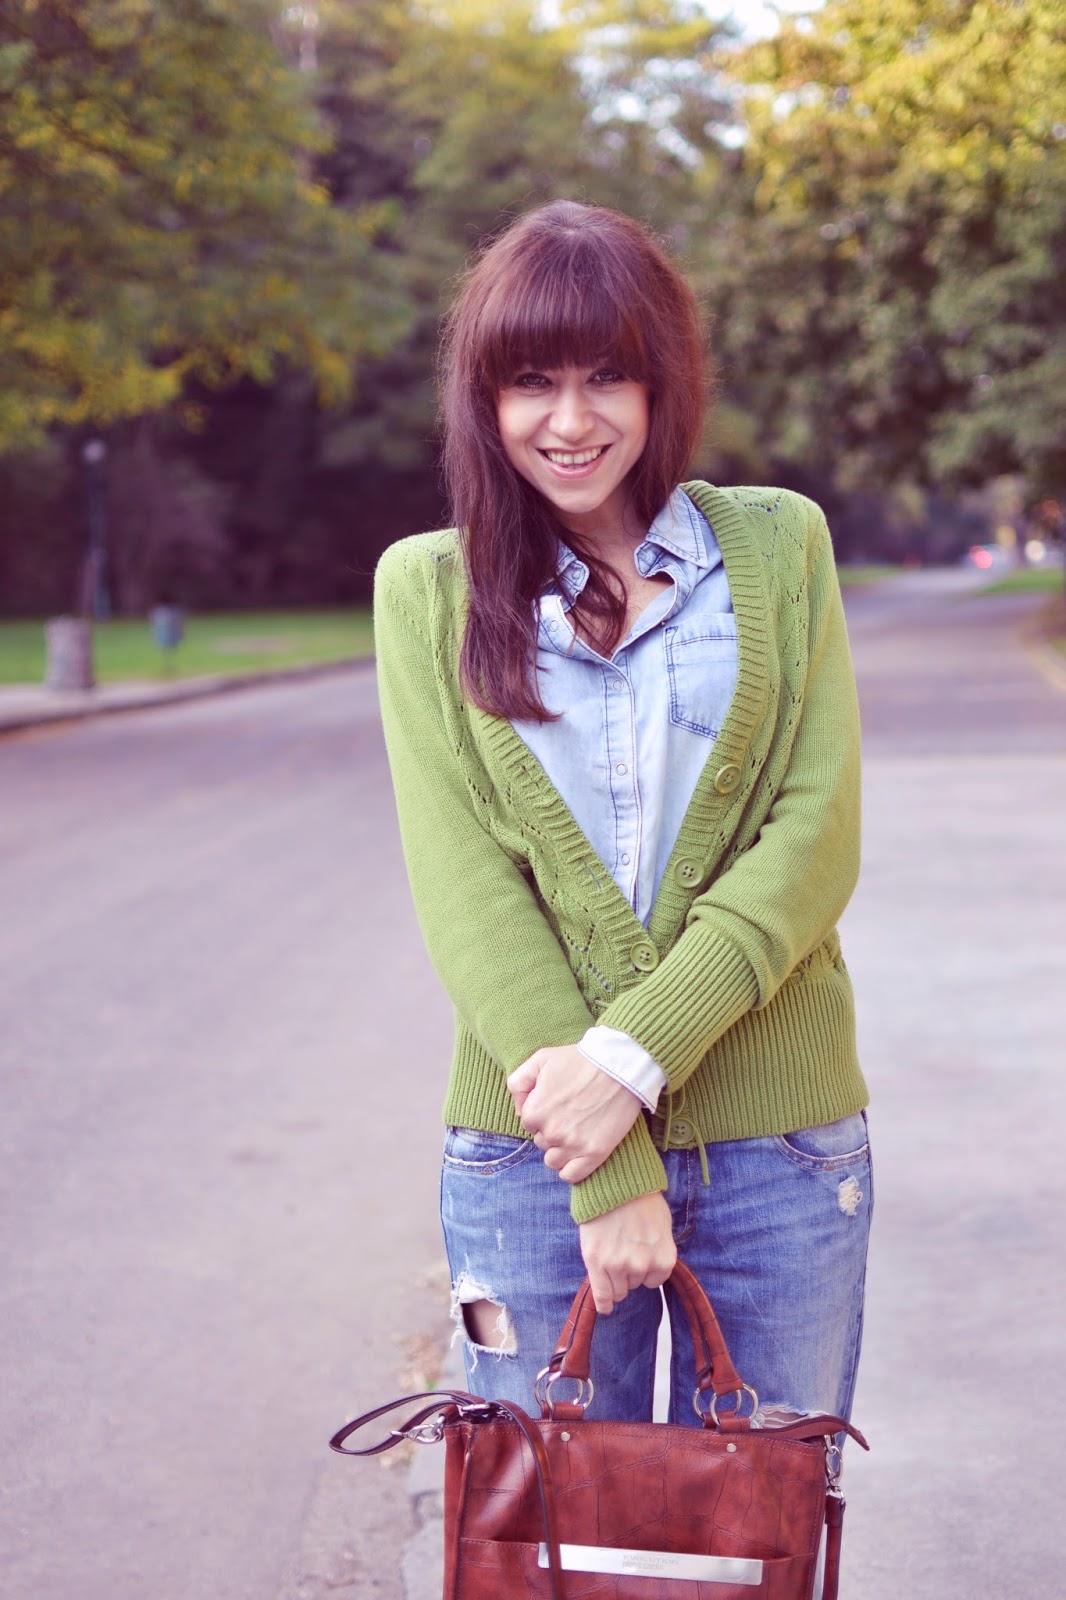 Stovky zrkadiel_Katharine-fashion is beautiful_Denim on denim_Roztrhané džínsy_Katarína Jakubčová_Fashion blogger